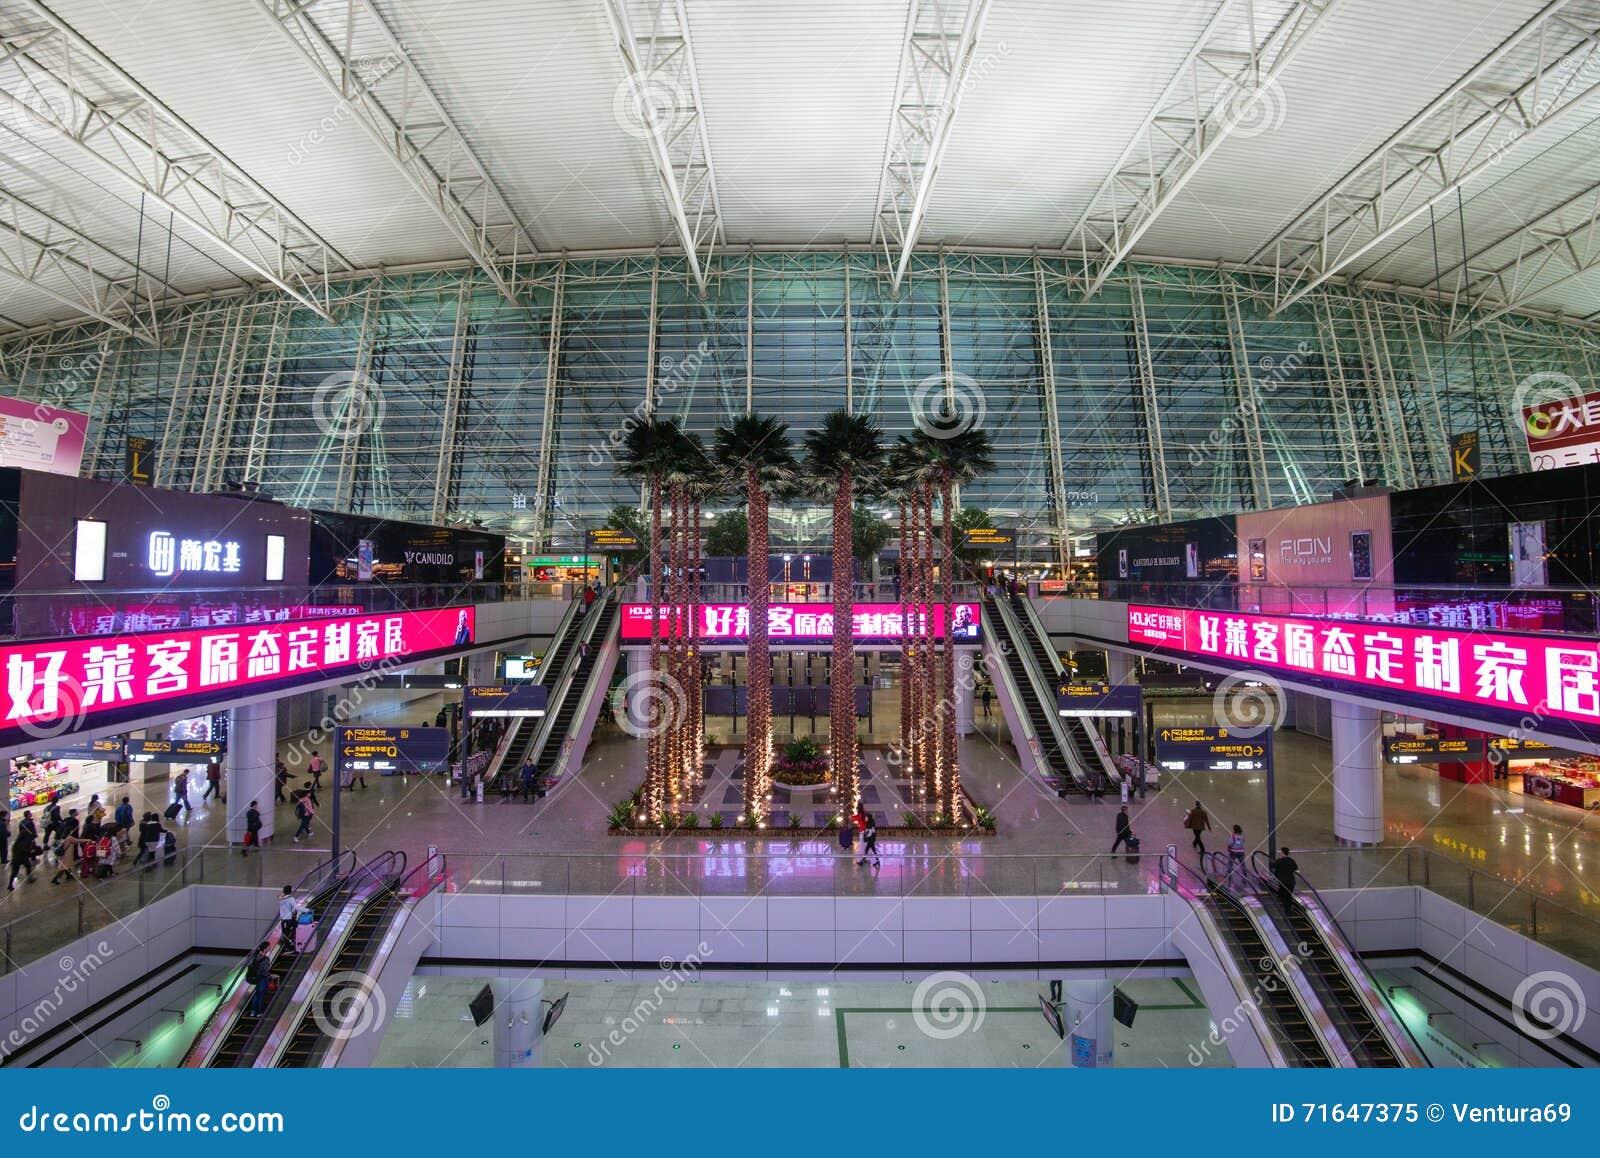 Aeroporto Guangzhou Arrive : Interior of baiyun international airport china editorial image